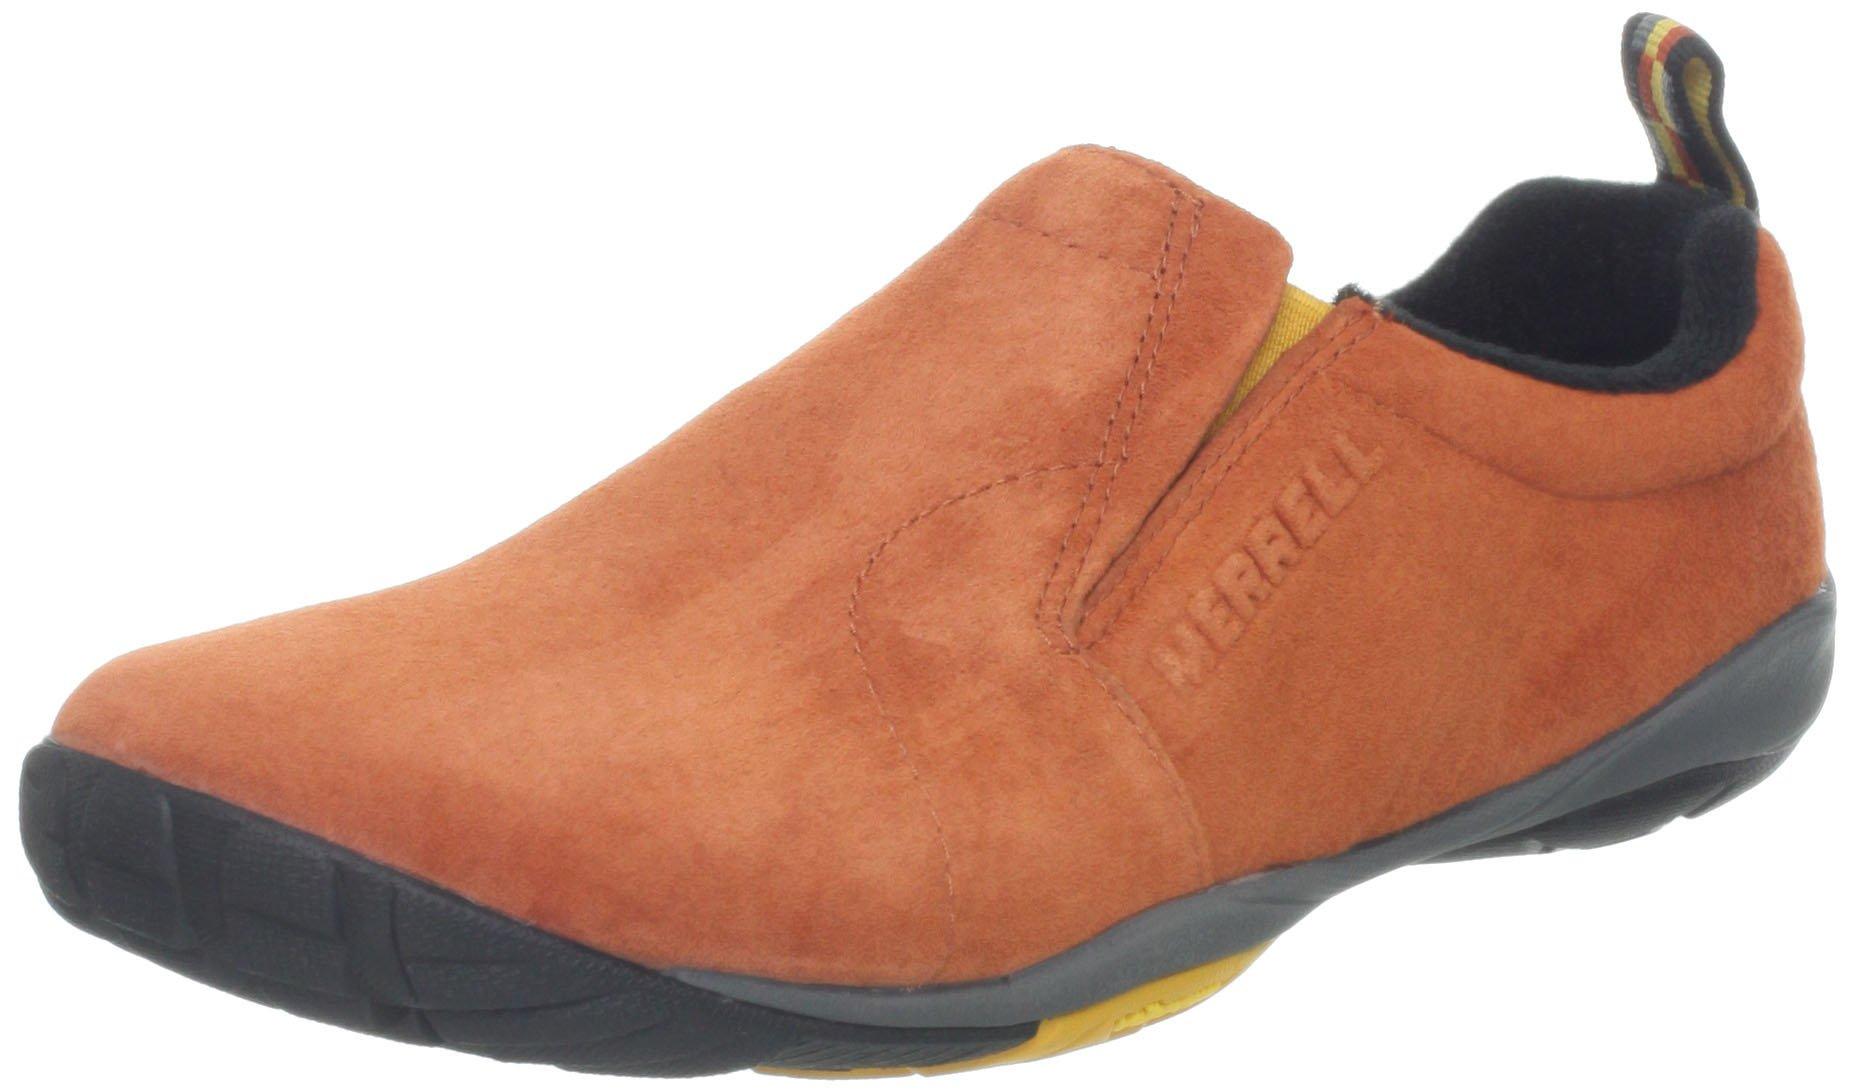 Merrell Women's Jungle Glove Fashion Sneaker,Orange,6 M US